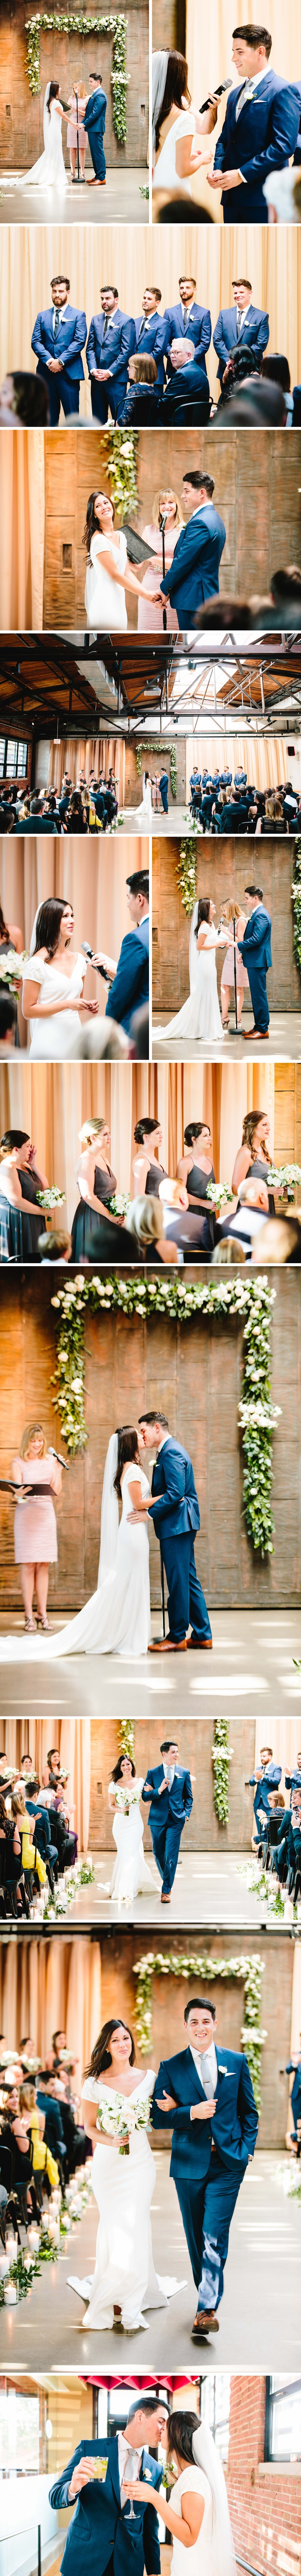 chicago-fine-art-wedding-photography-penninger7